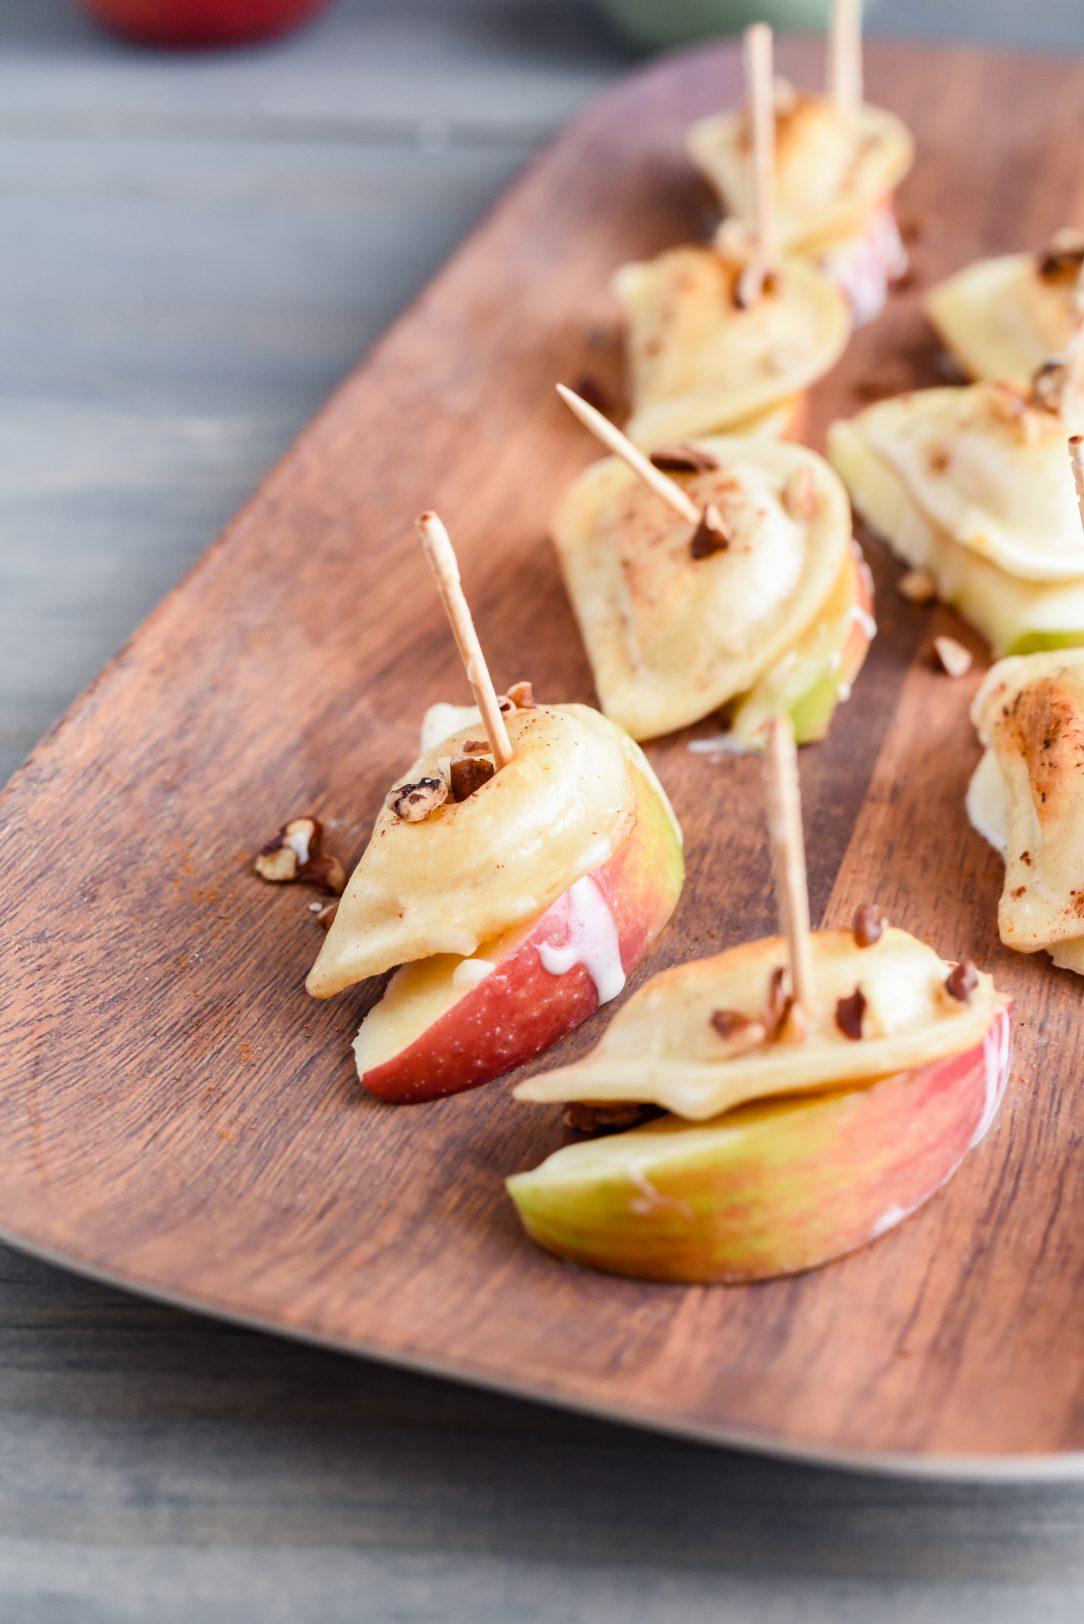 My Modern Cookery - Apple Pierogy Bites with Crème Fraîche